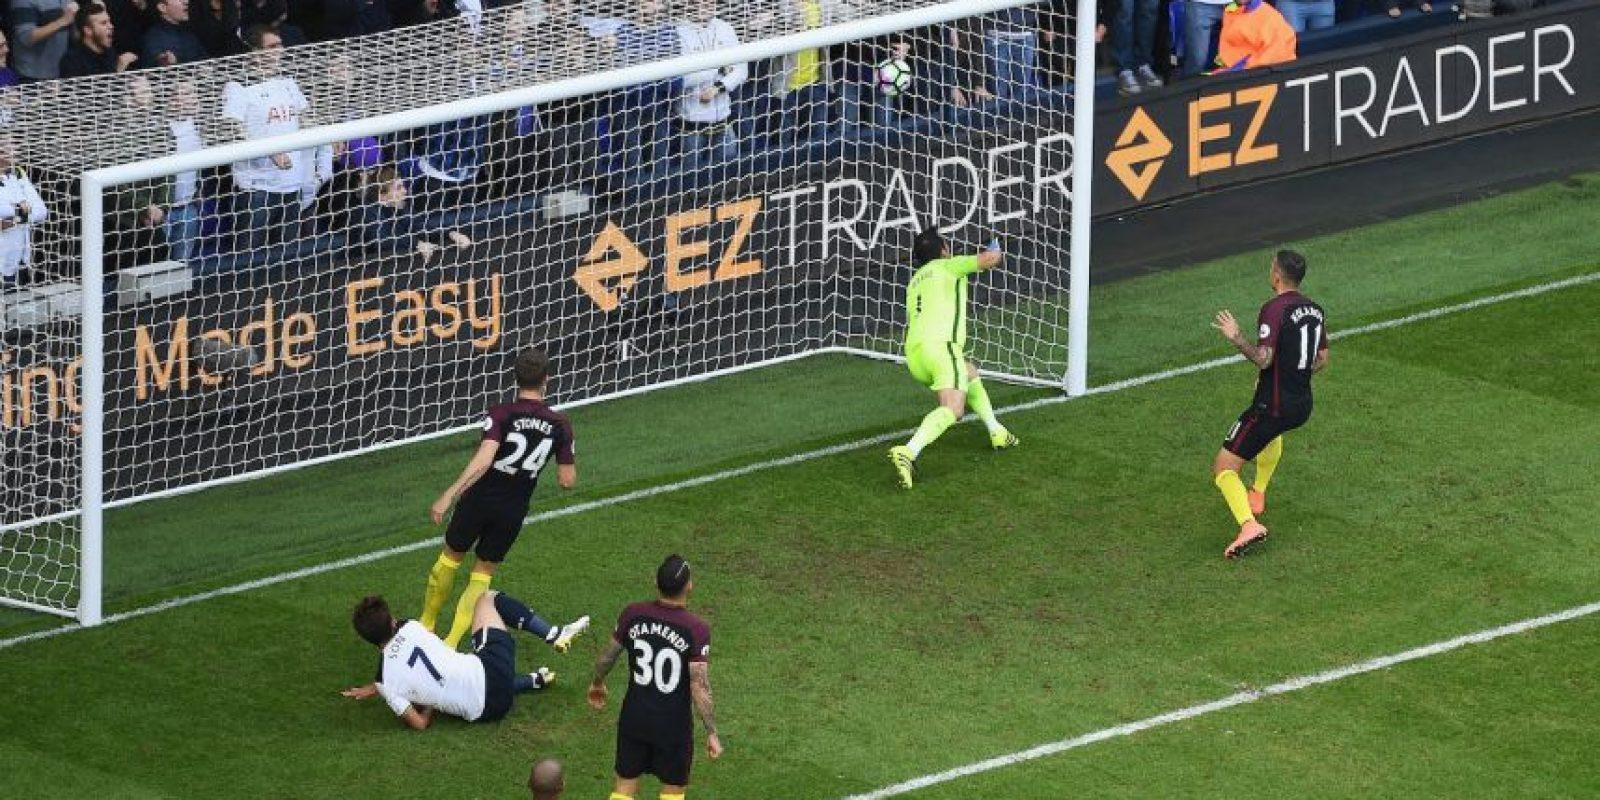 Tottenham fue el segundo partido sin ganar de Manchester City. Cayeron por 2 a 0